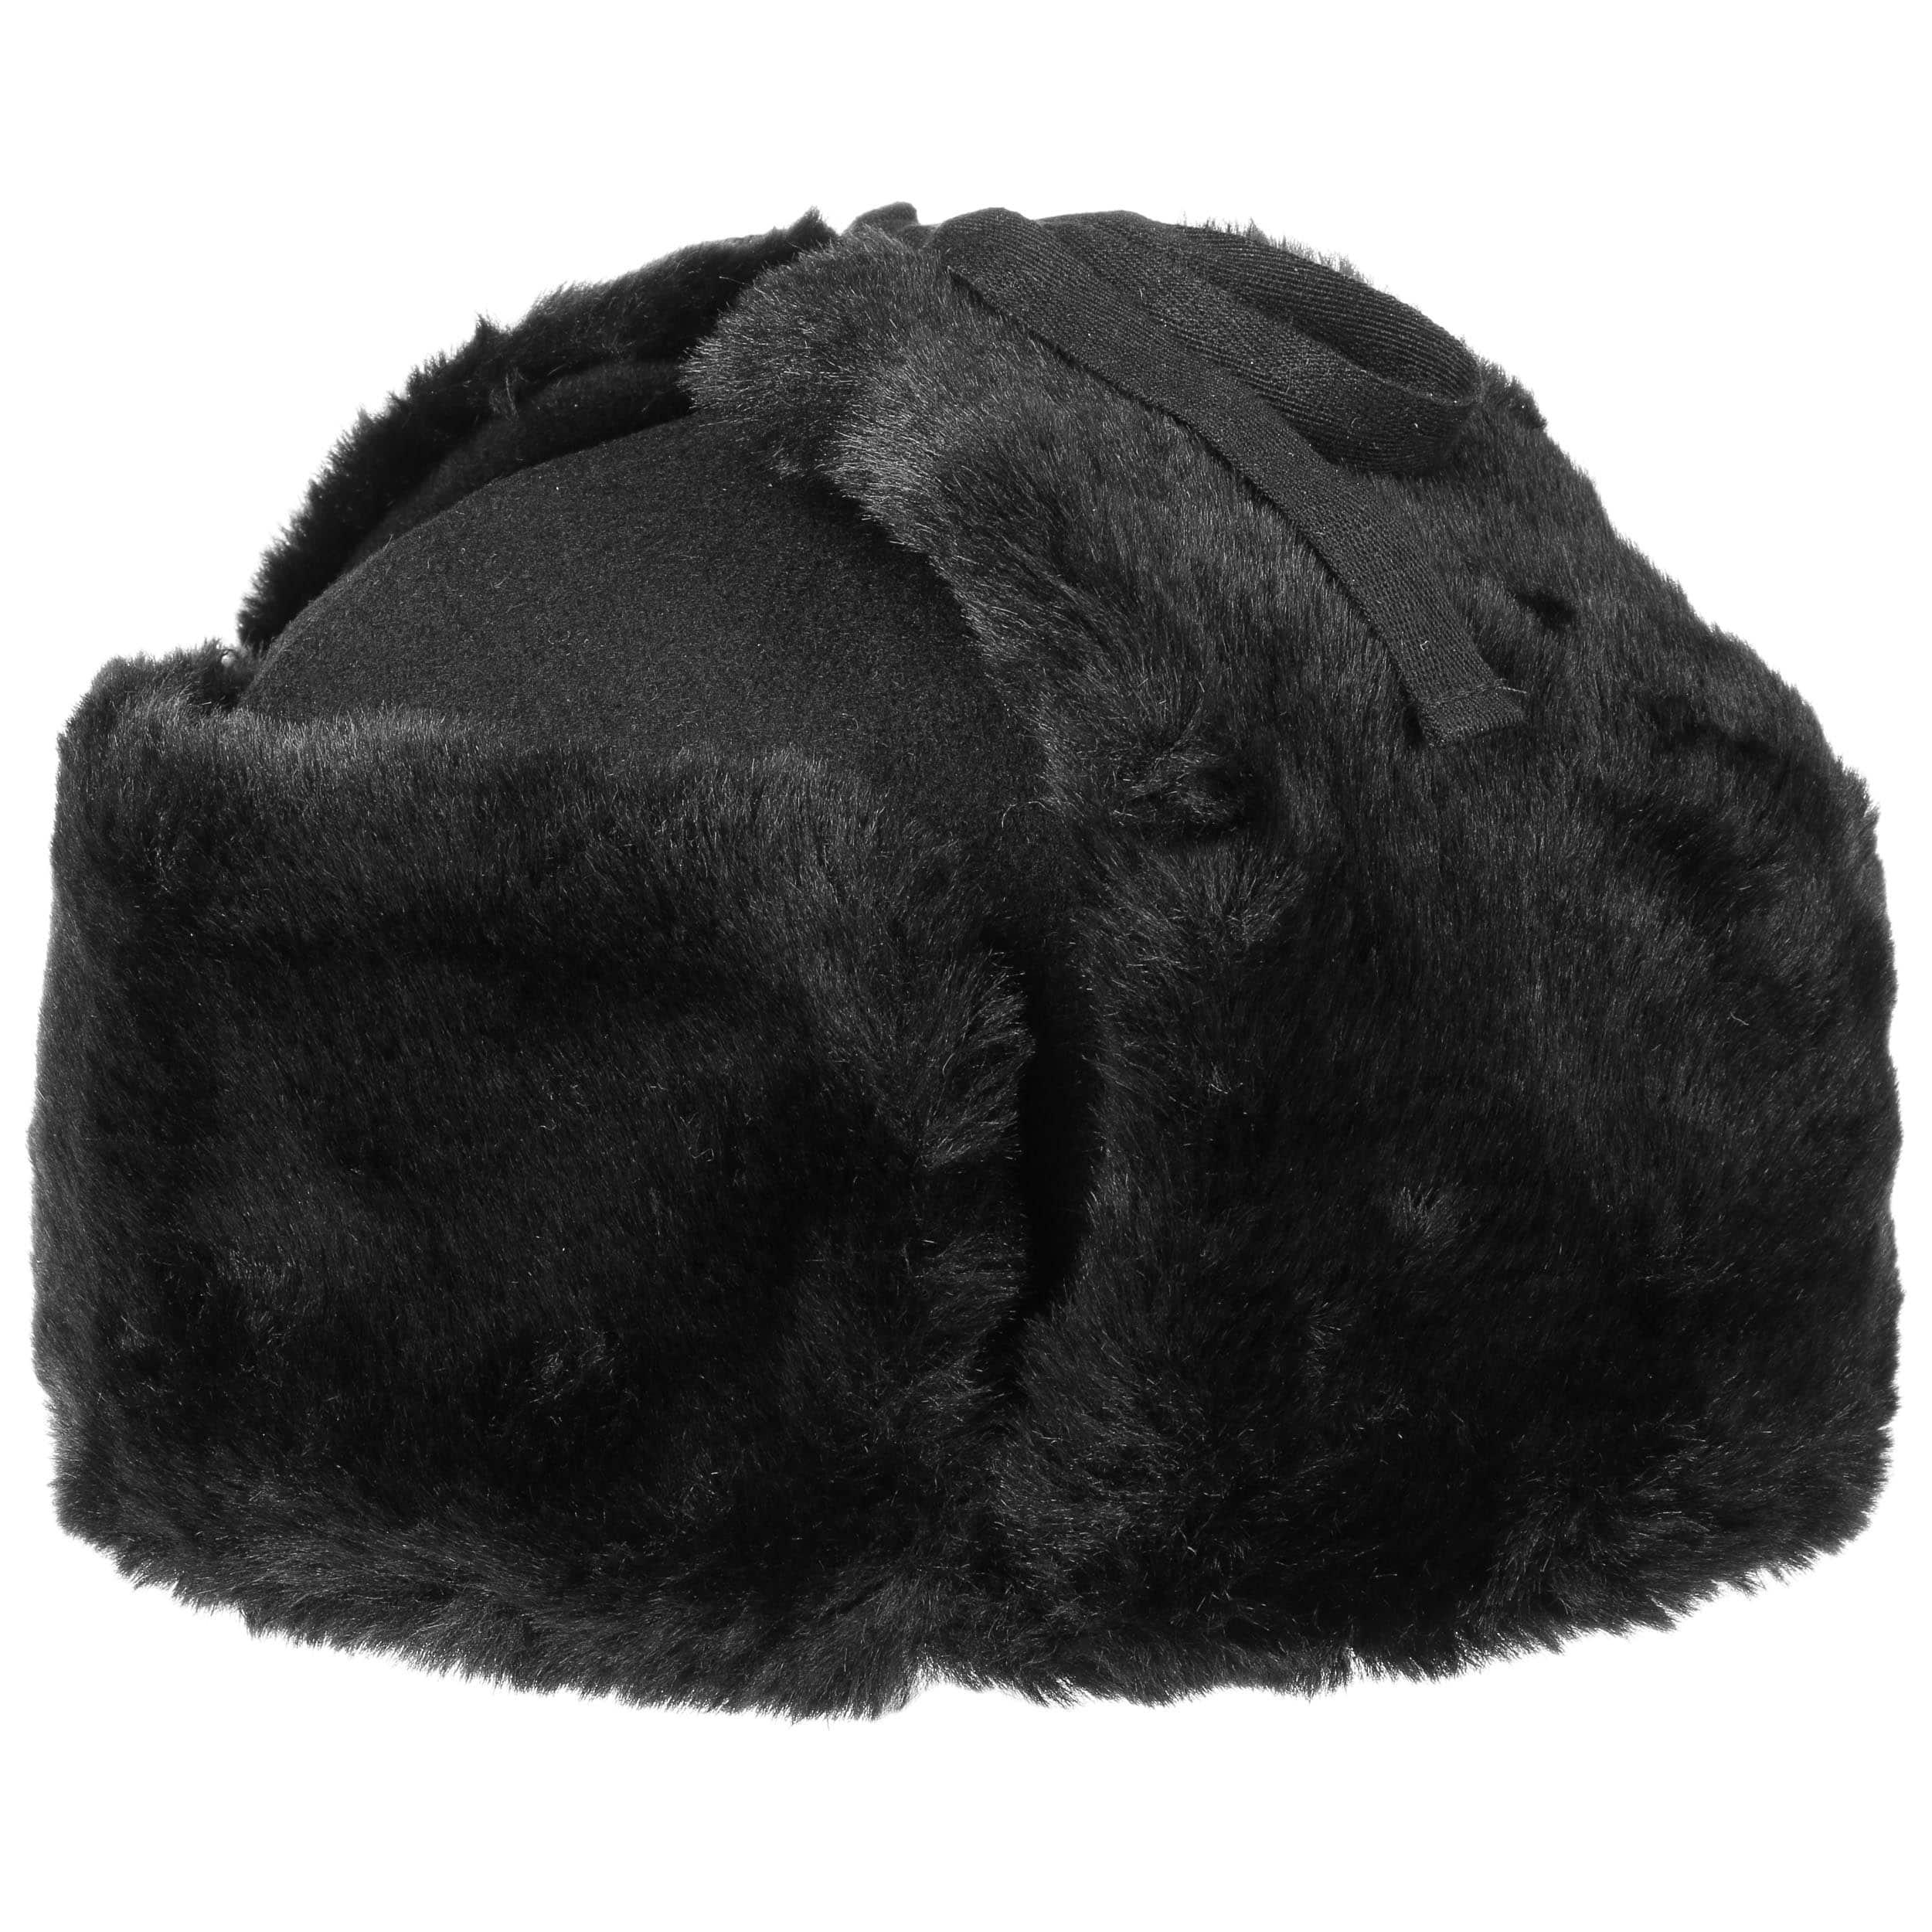 6dc86fc4cc2 ... Ushanka Aviator Hat by Kangol - black 6 ...